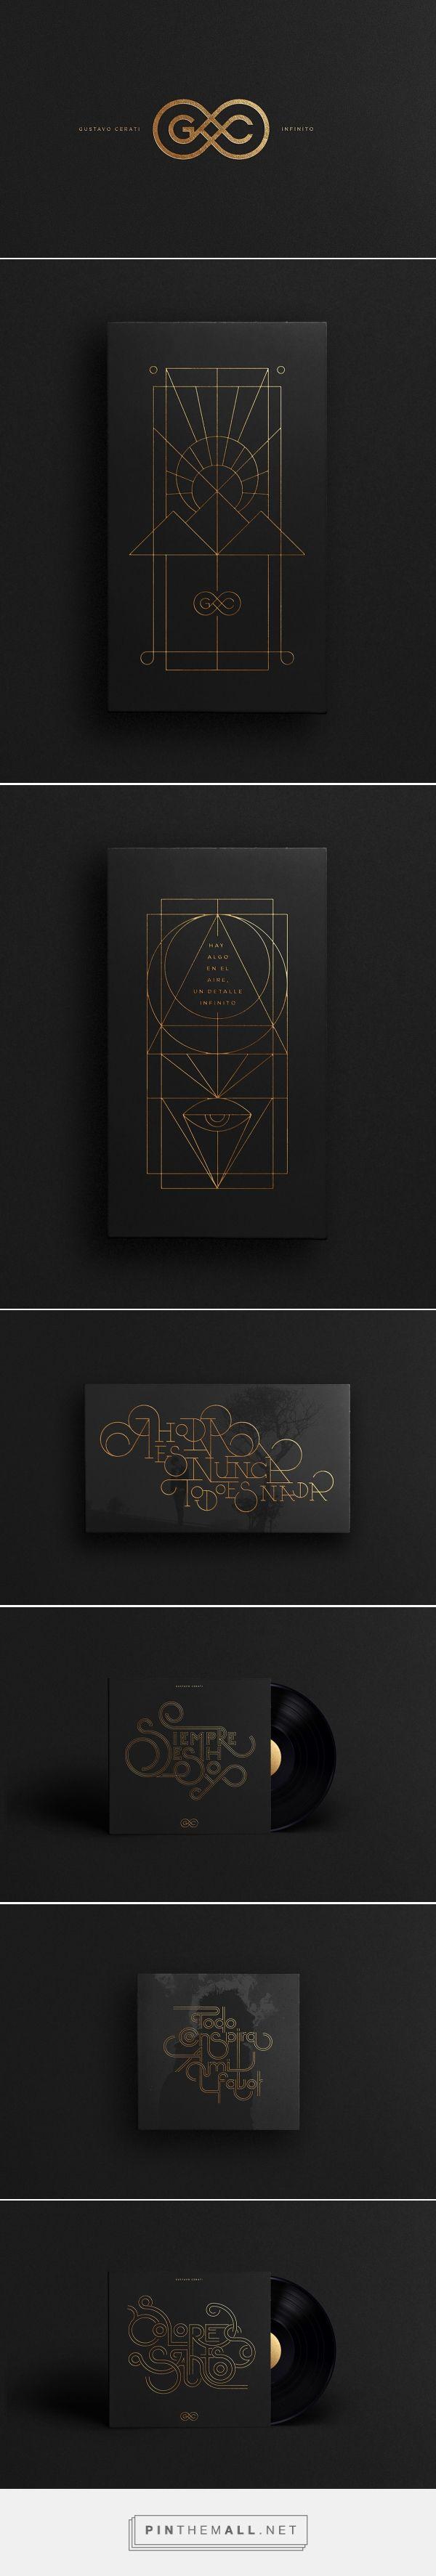 Infinito, un homenaje a Gustavo Cerati – Nice Fucking Graphics! - created on 2016-10-12 15:30:26